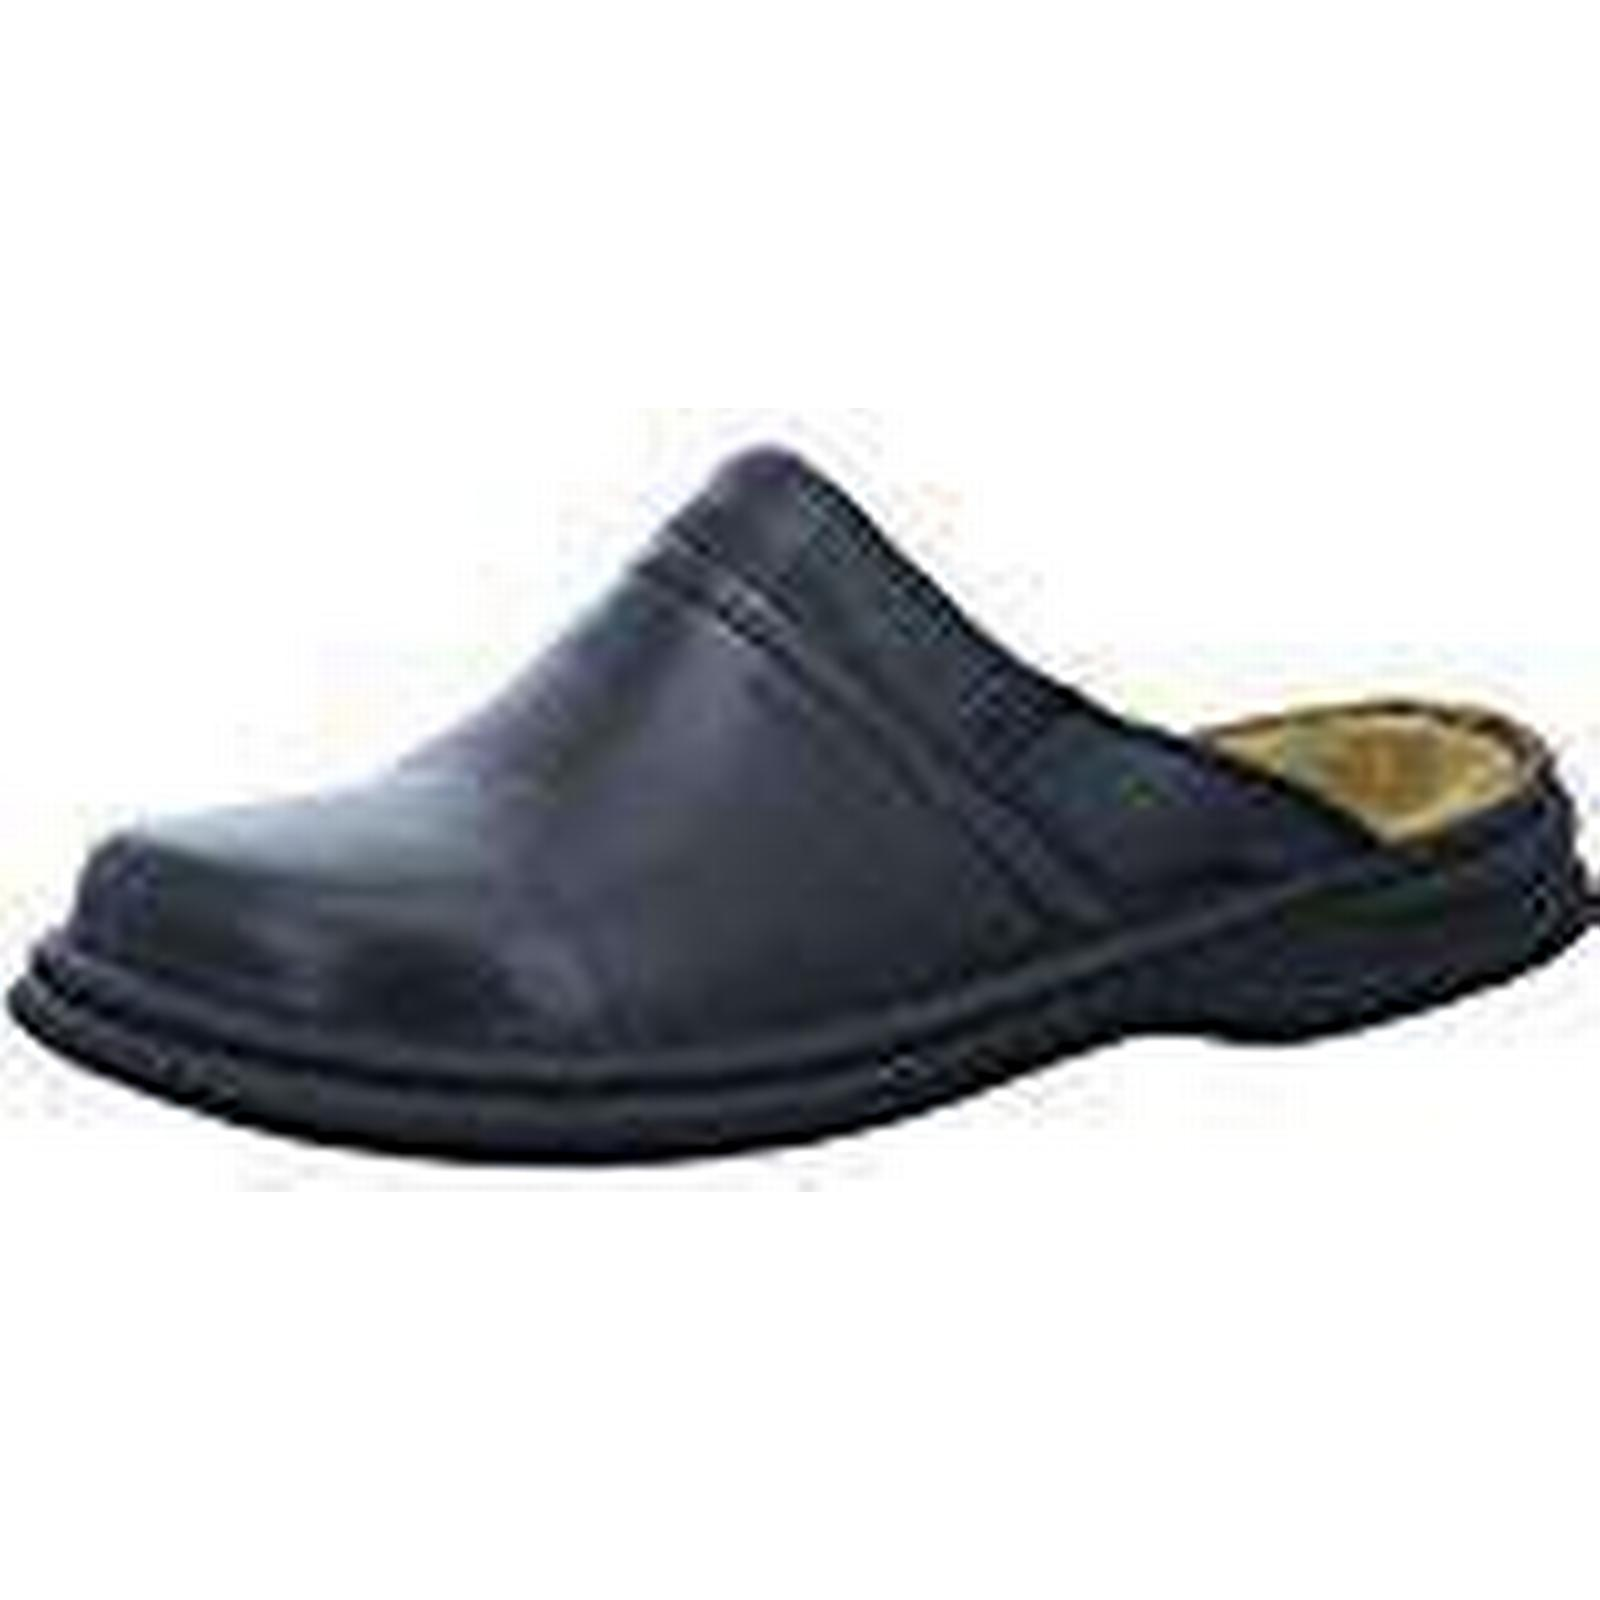 Josef Seibel Leather Max Men Clogs, Genuine Leather Seibel Men's Shoes, Black 13 UK(48 EU) c46378